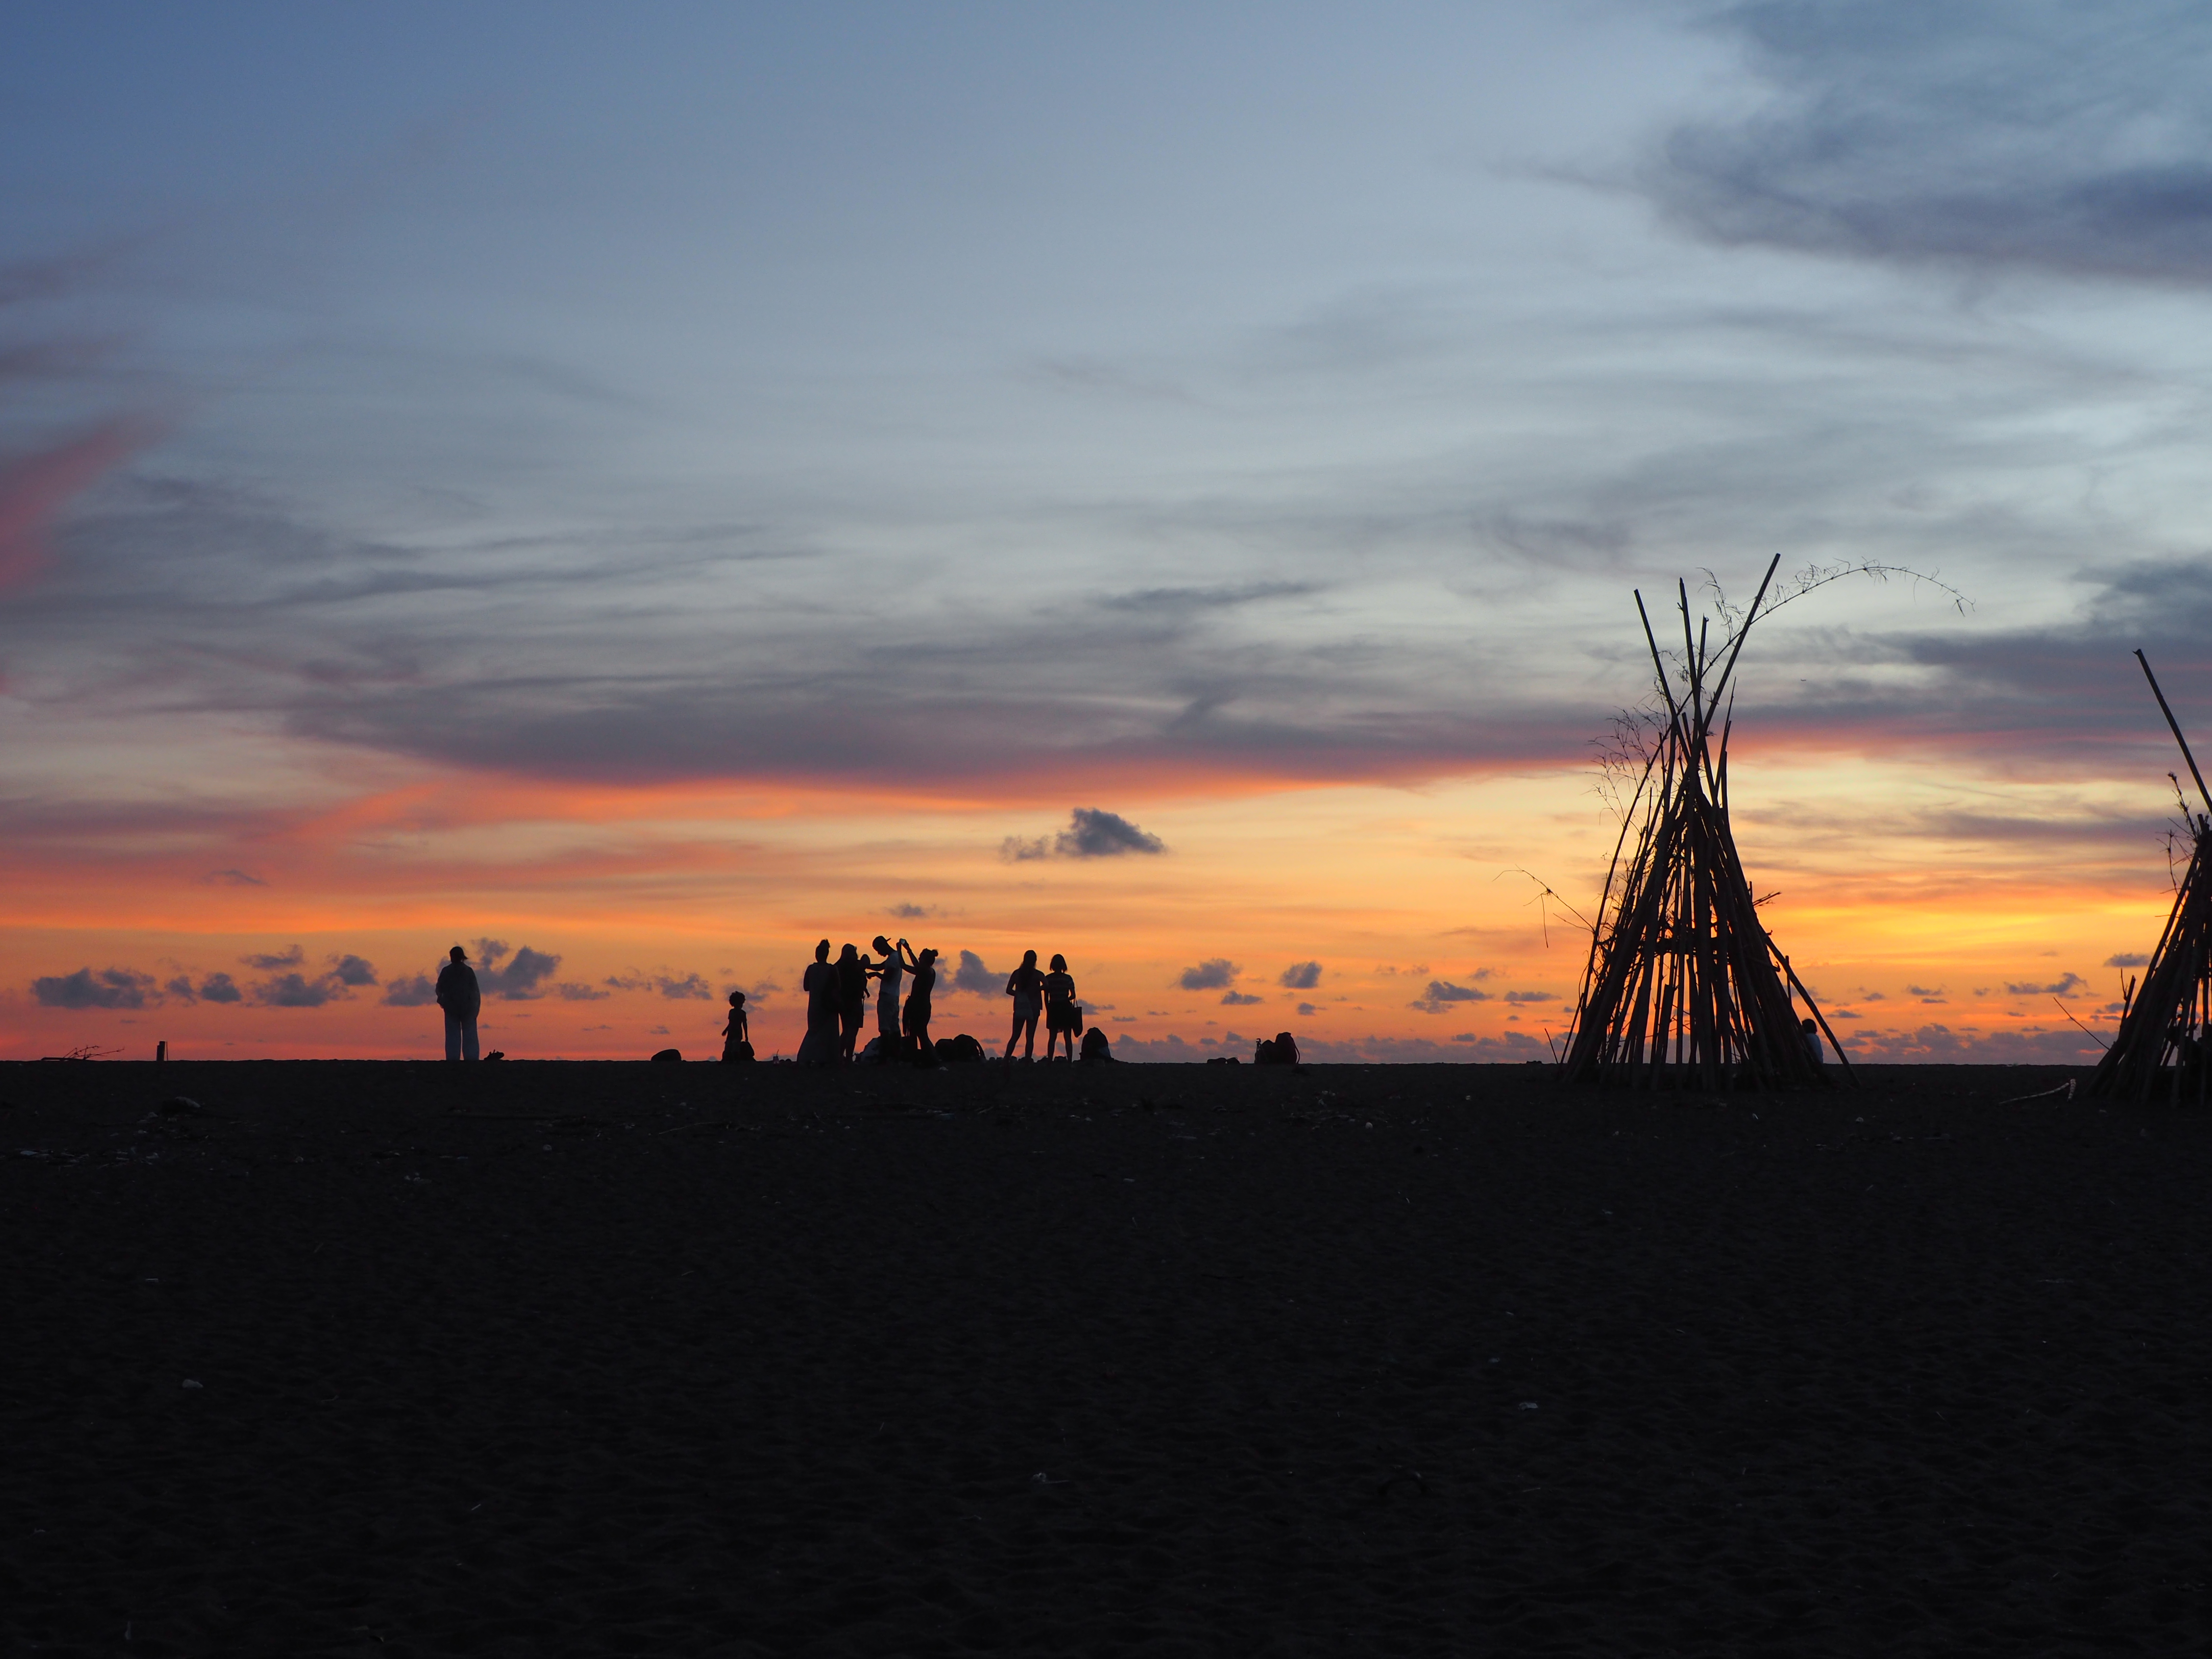 Beach Ocean Sunset Coastline 2